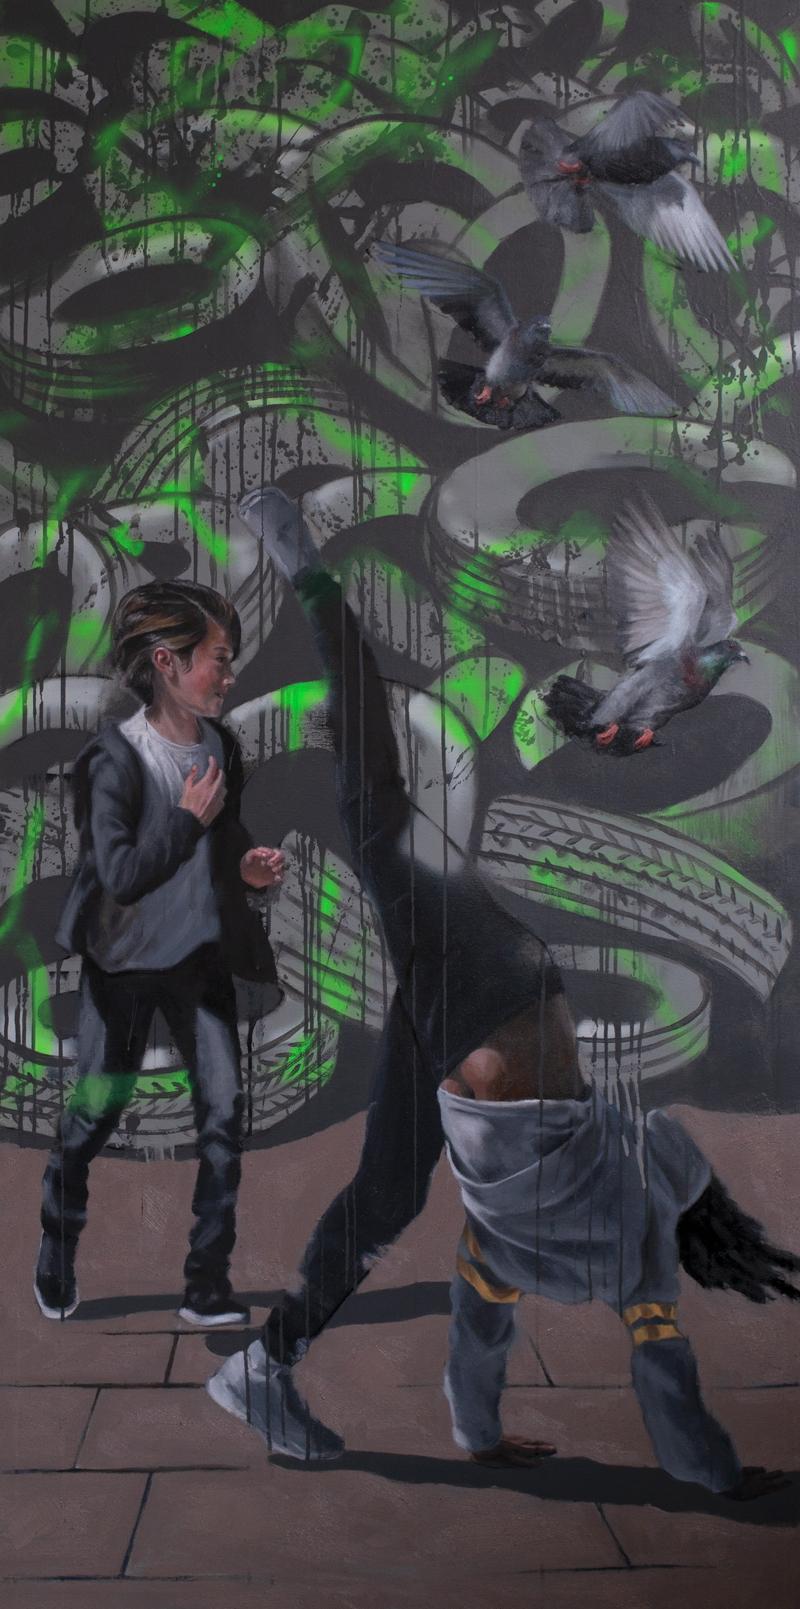 Troy Stuart, <em>Adapt</em>,<br> mixed media on canvas, 150 x 80cm